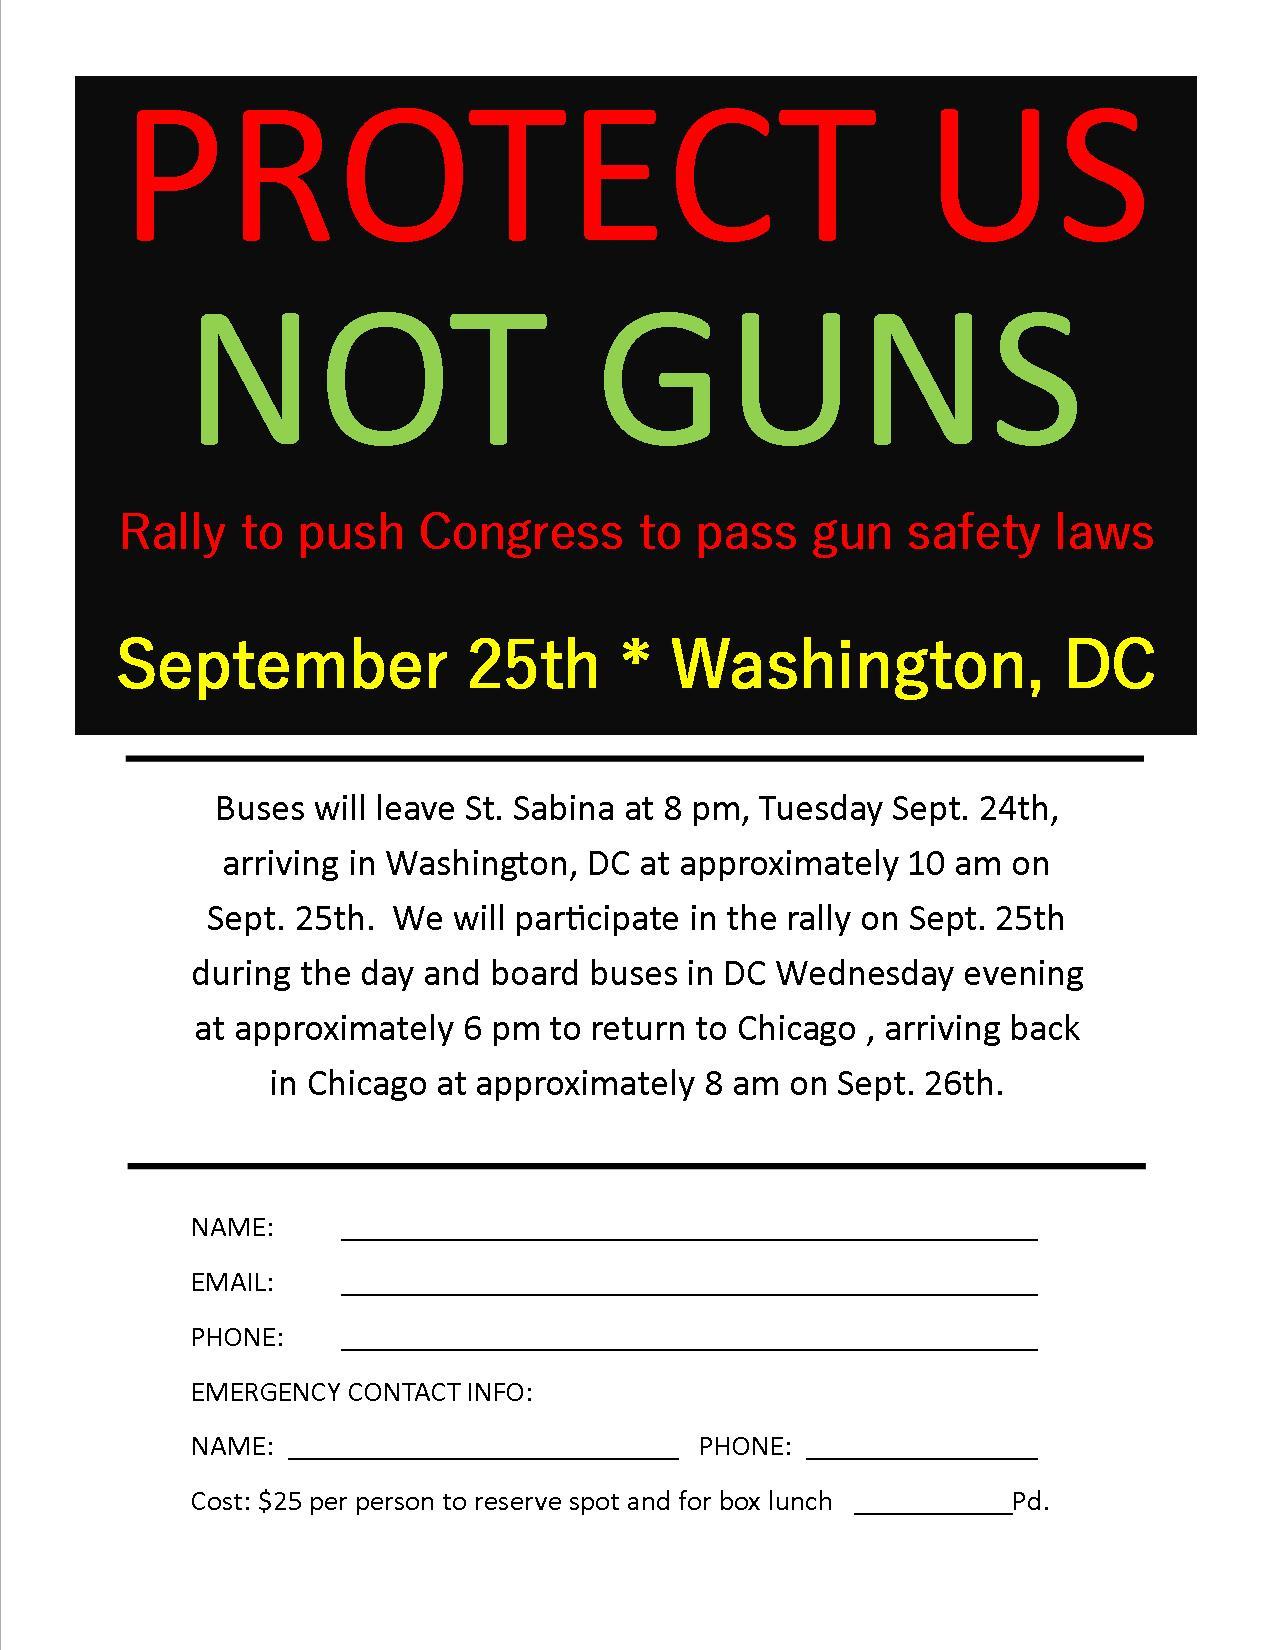 Protect Us not Guns.jpg